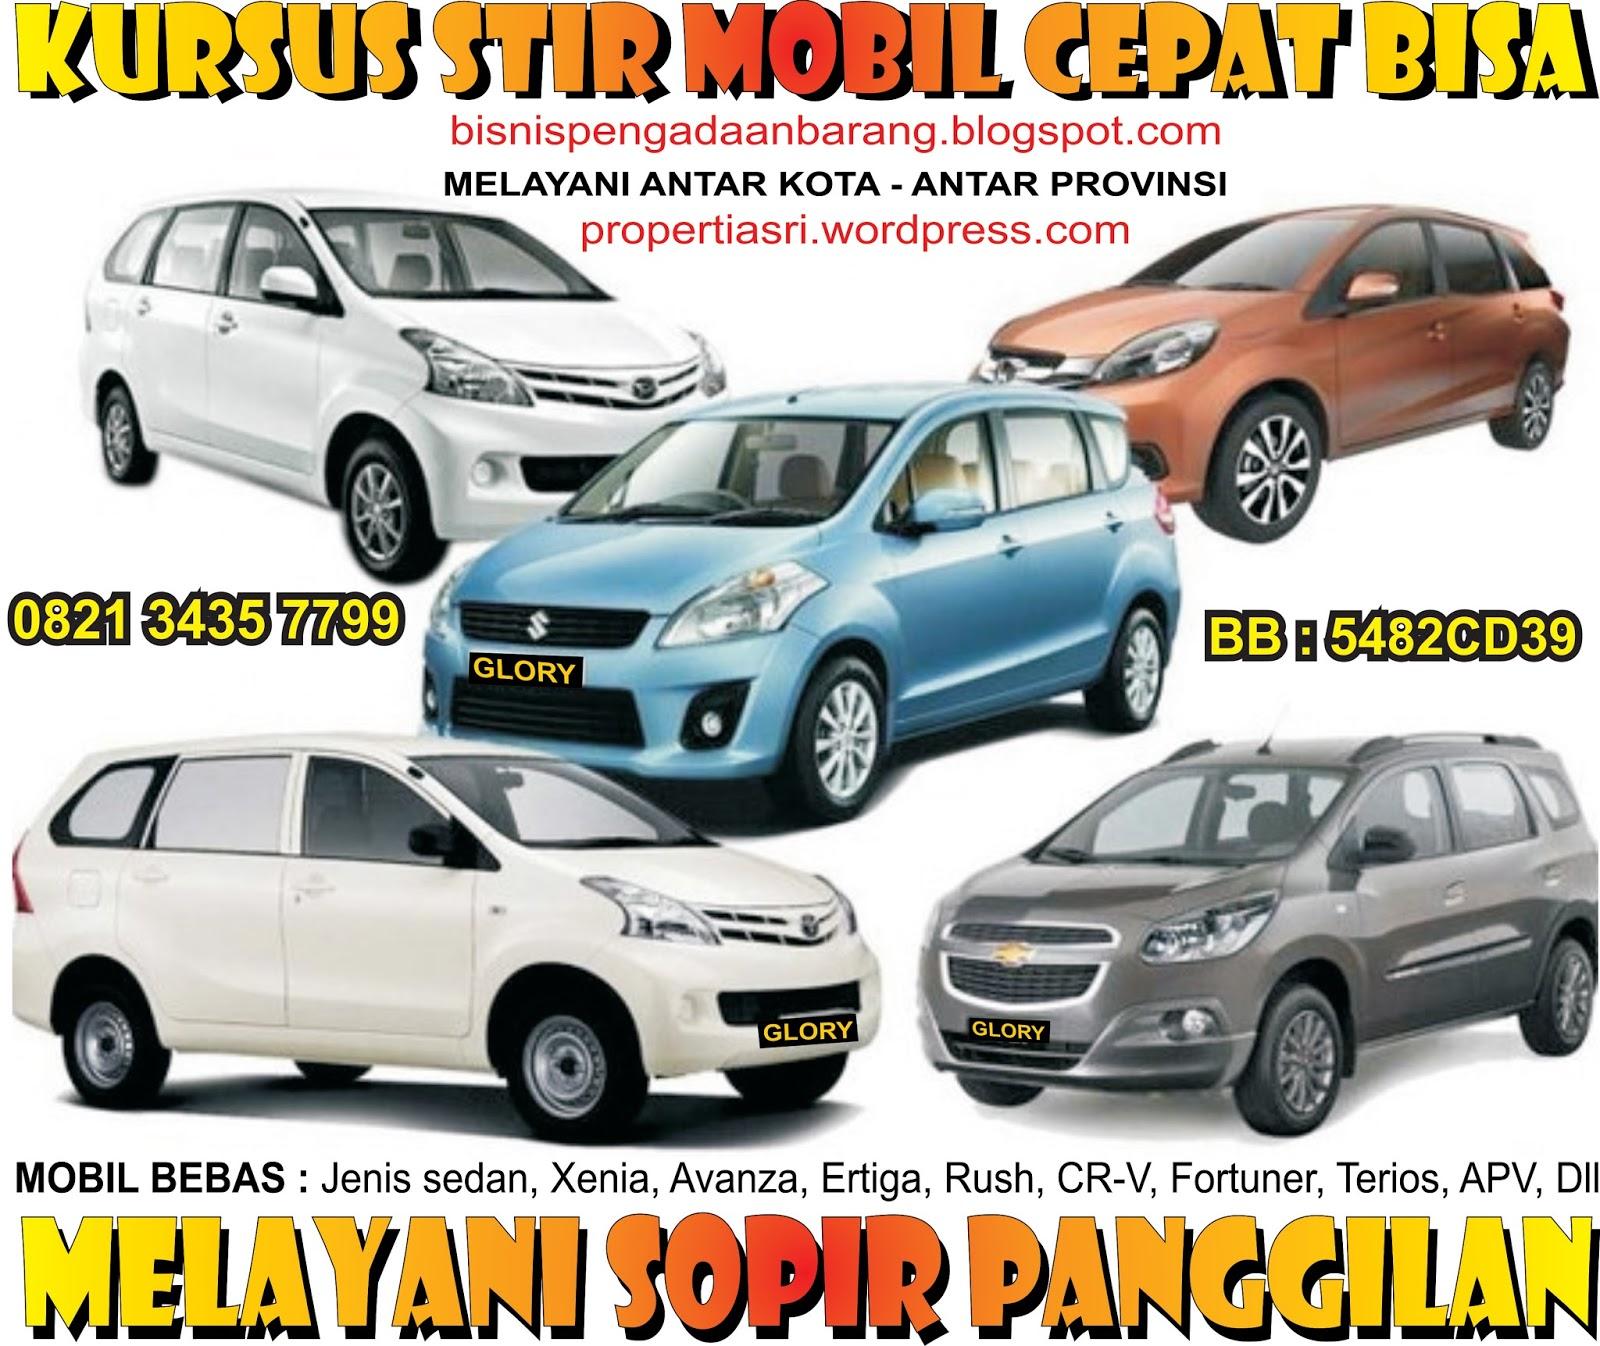 Harga Ganti Atap Baja Ringan Tour And Travel, Jual Tiket Promo, Jasa Antar Jemput ...